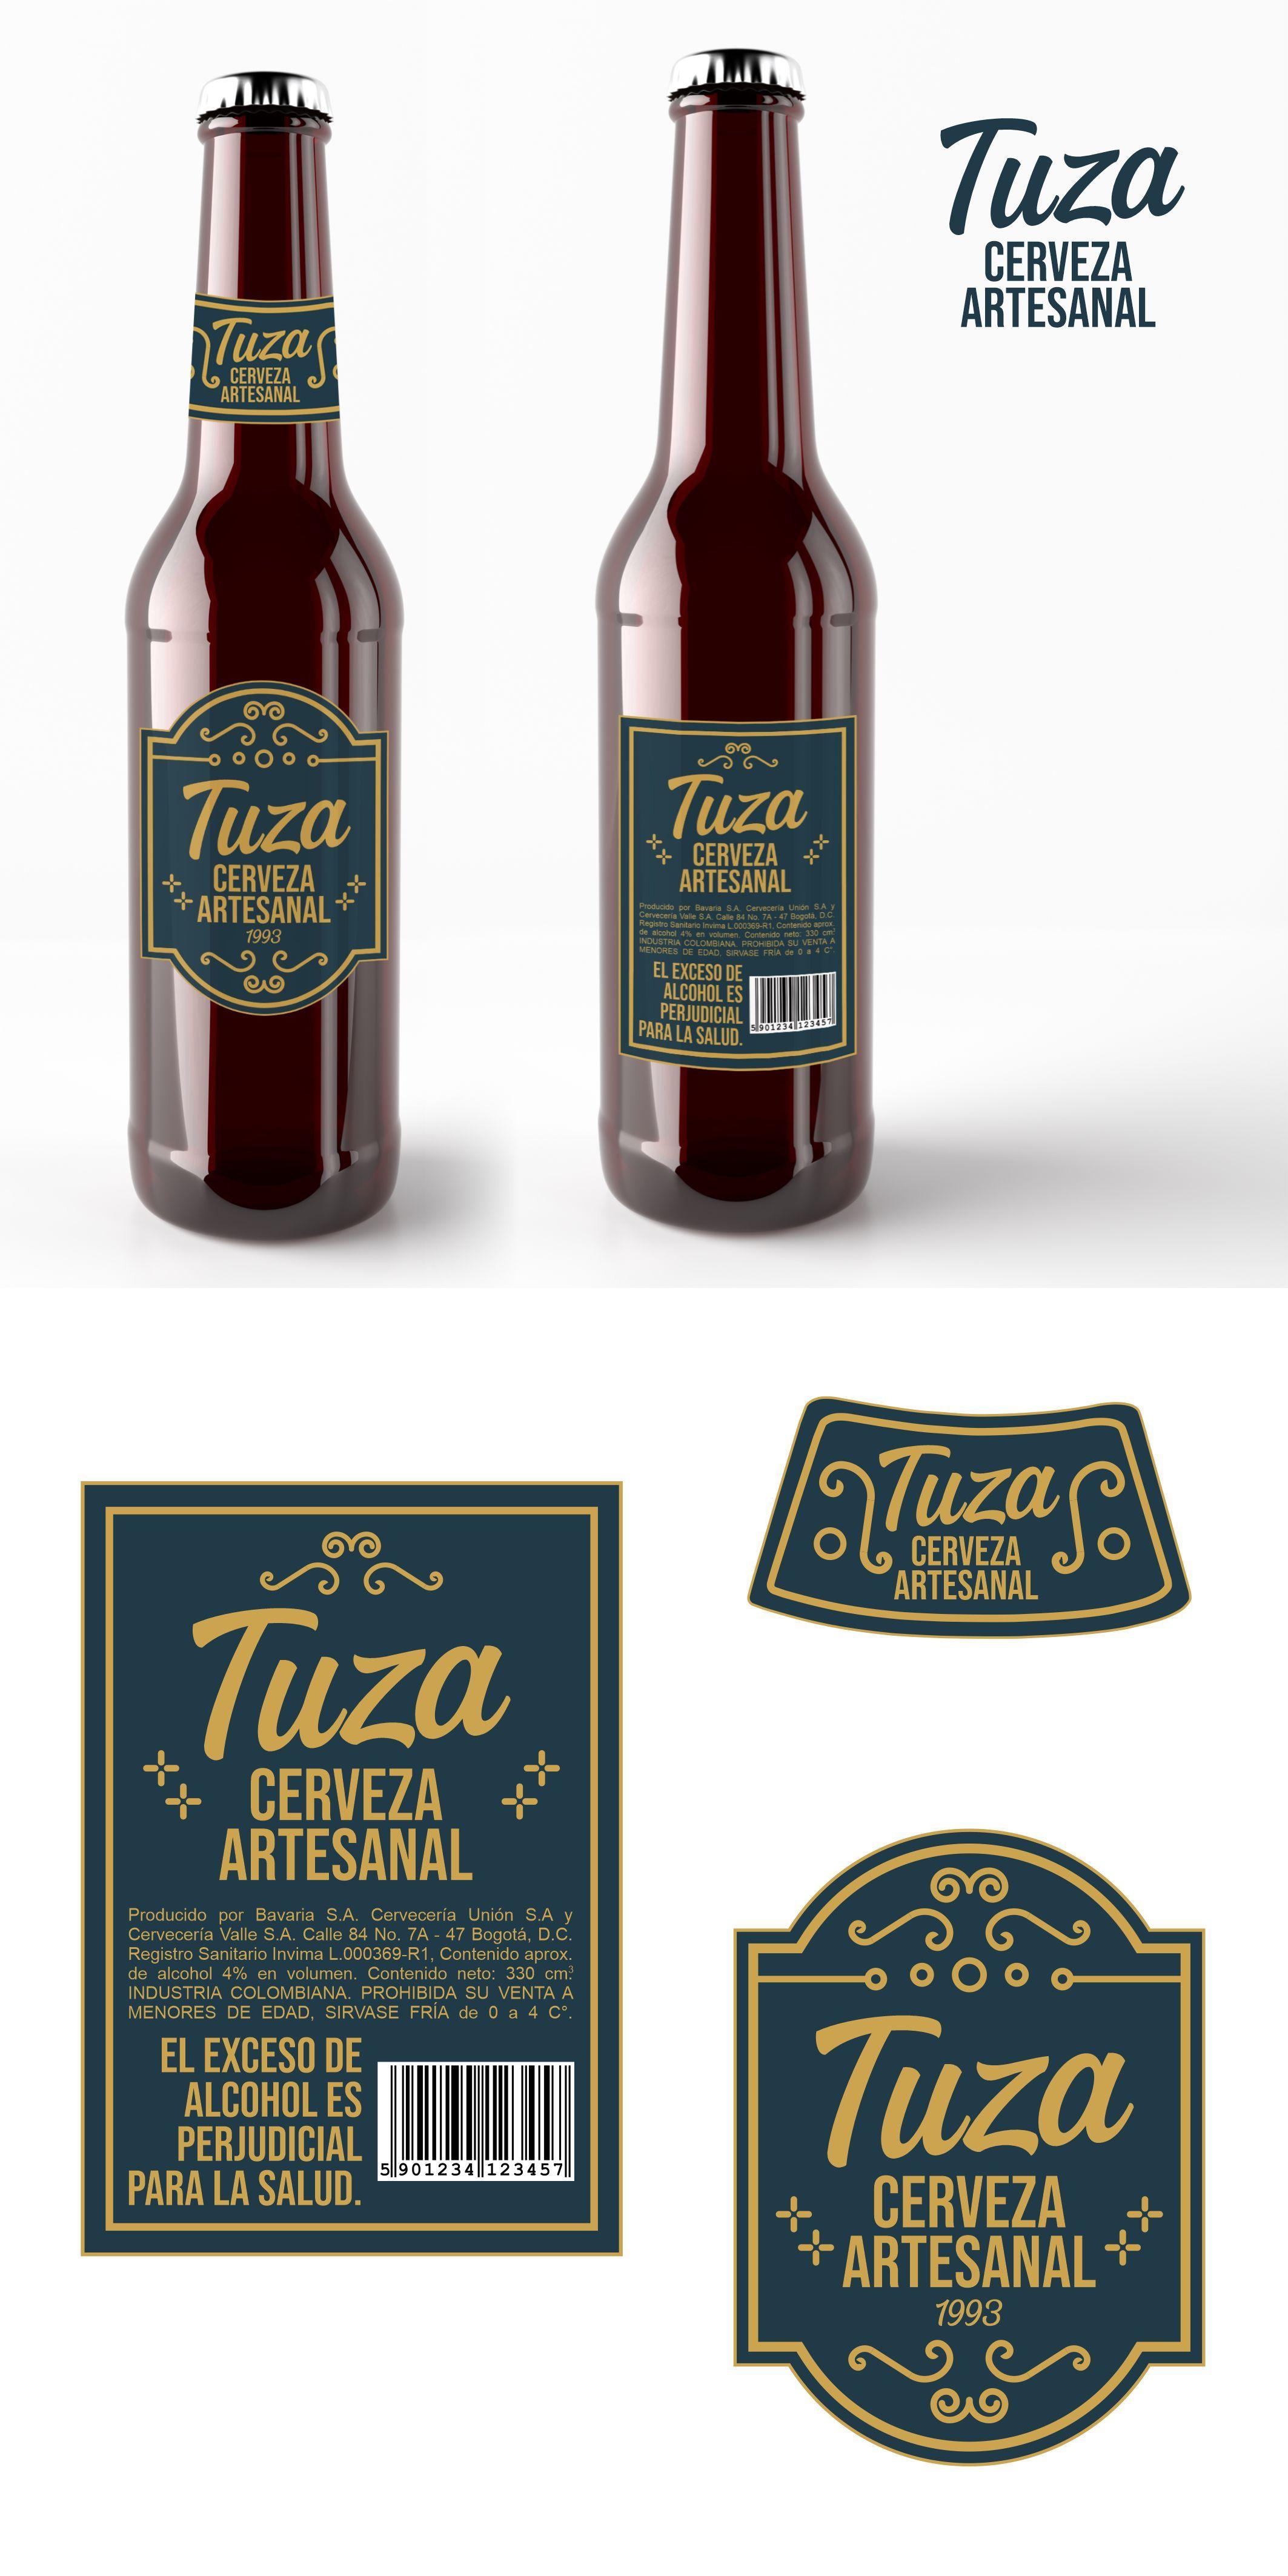 Pin De Cristhian Ferreira Cferr En Material Pop Y Otros Cerveza Artesanal Cerveceria Alcohol